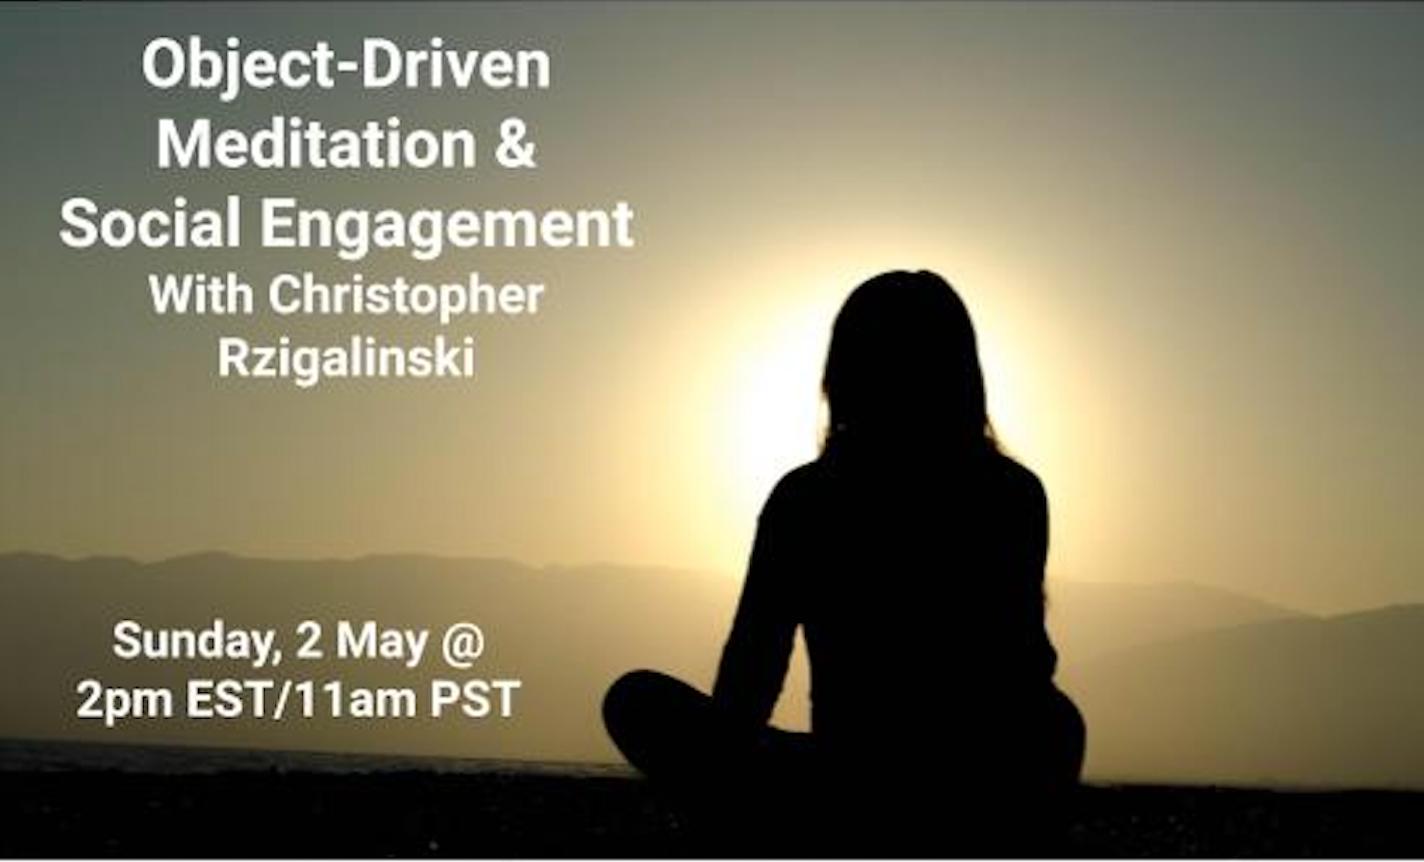 Object-Driven Meditation and Social Engagement Workshop